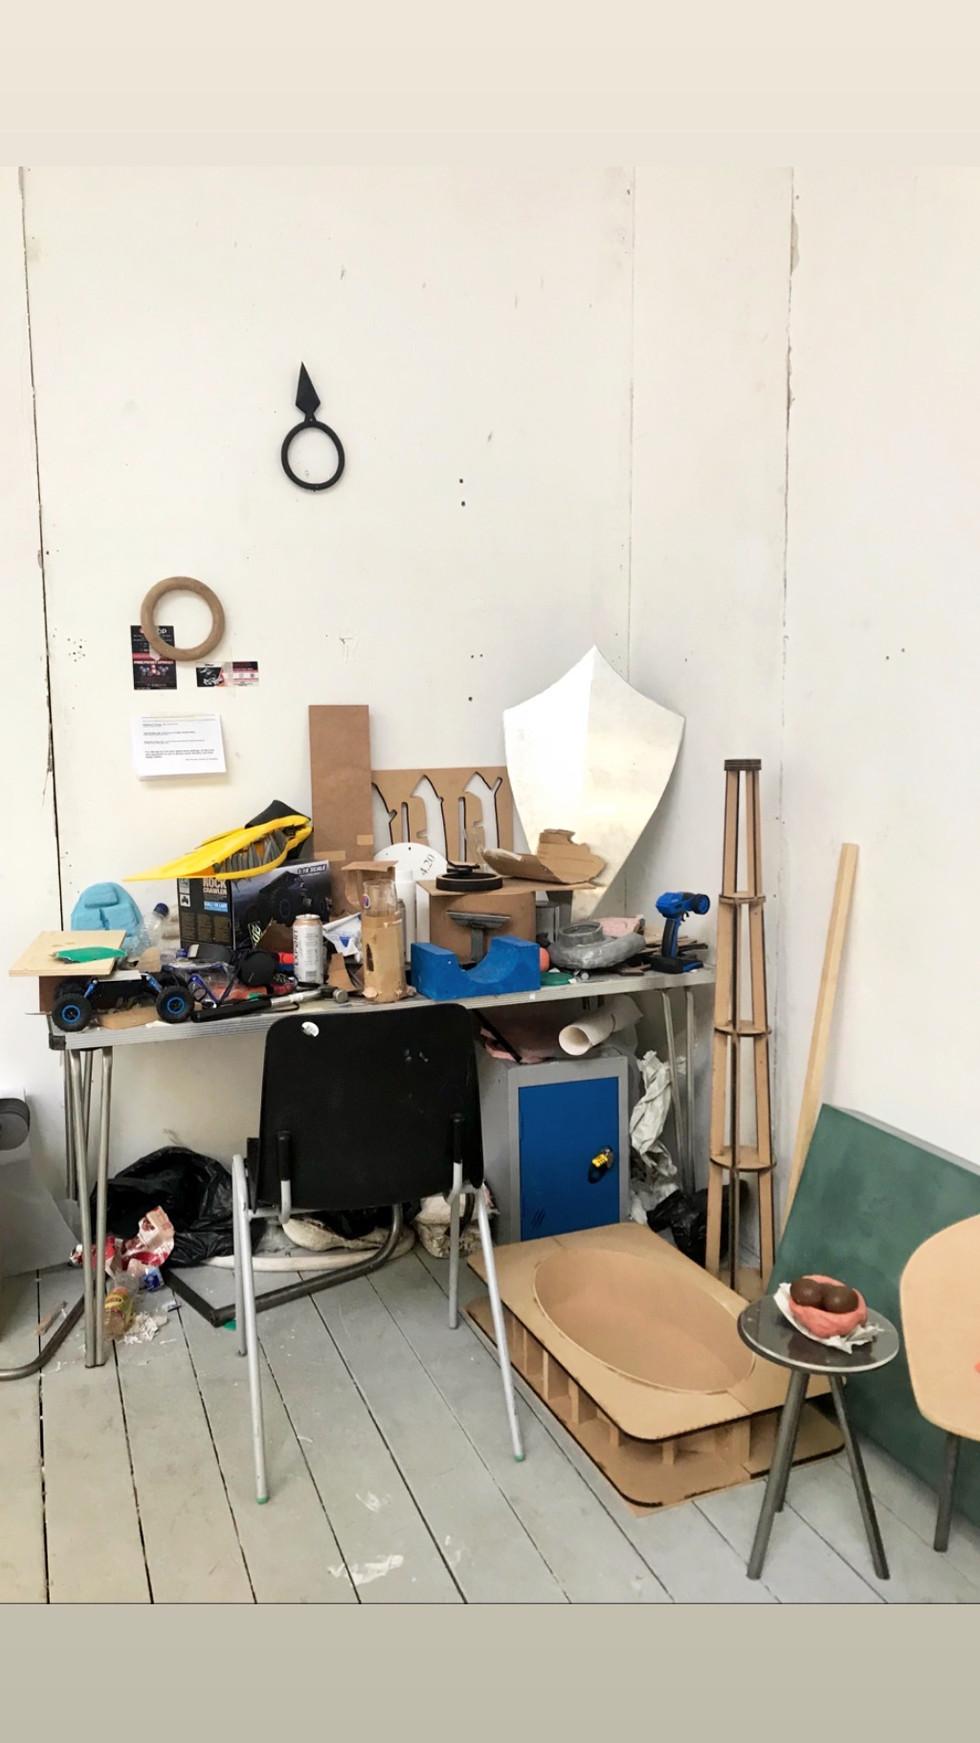 studio shot, march 2019